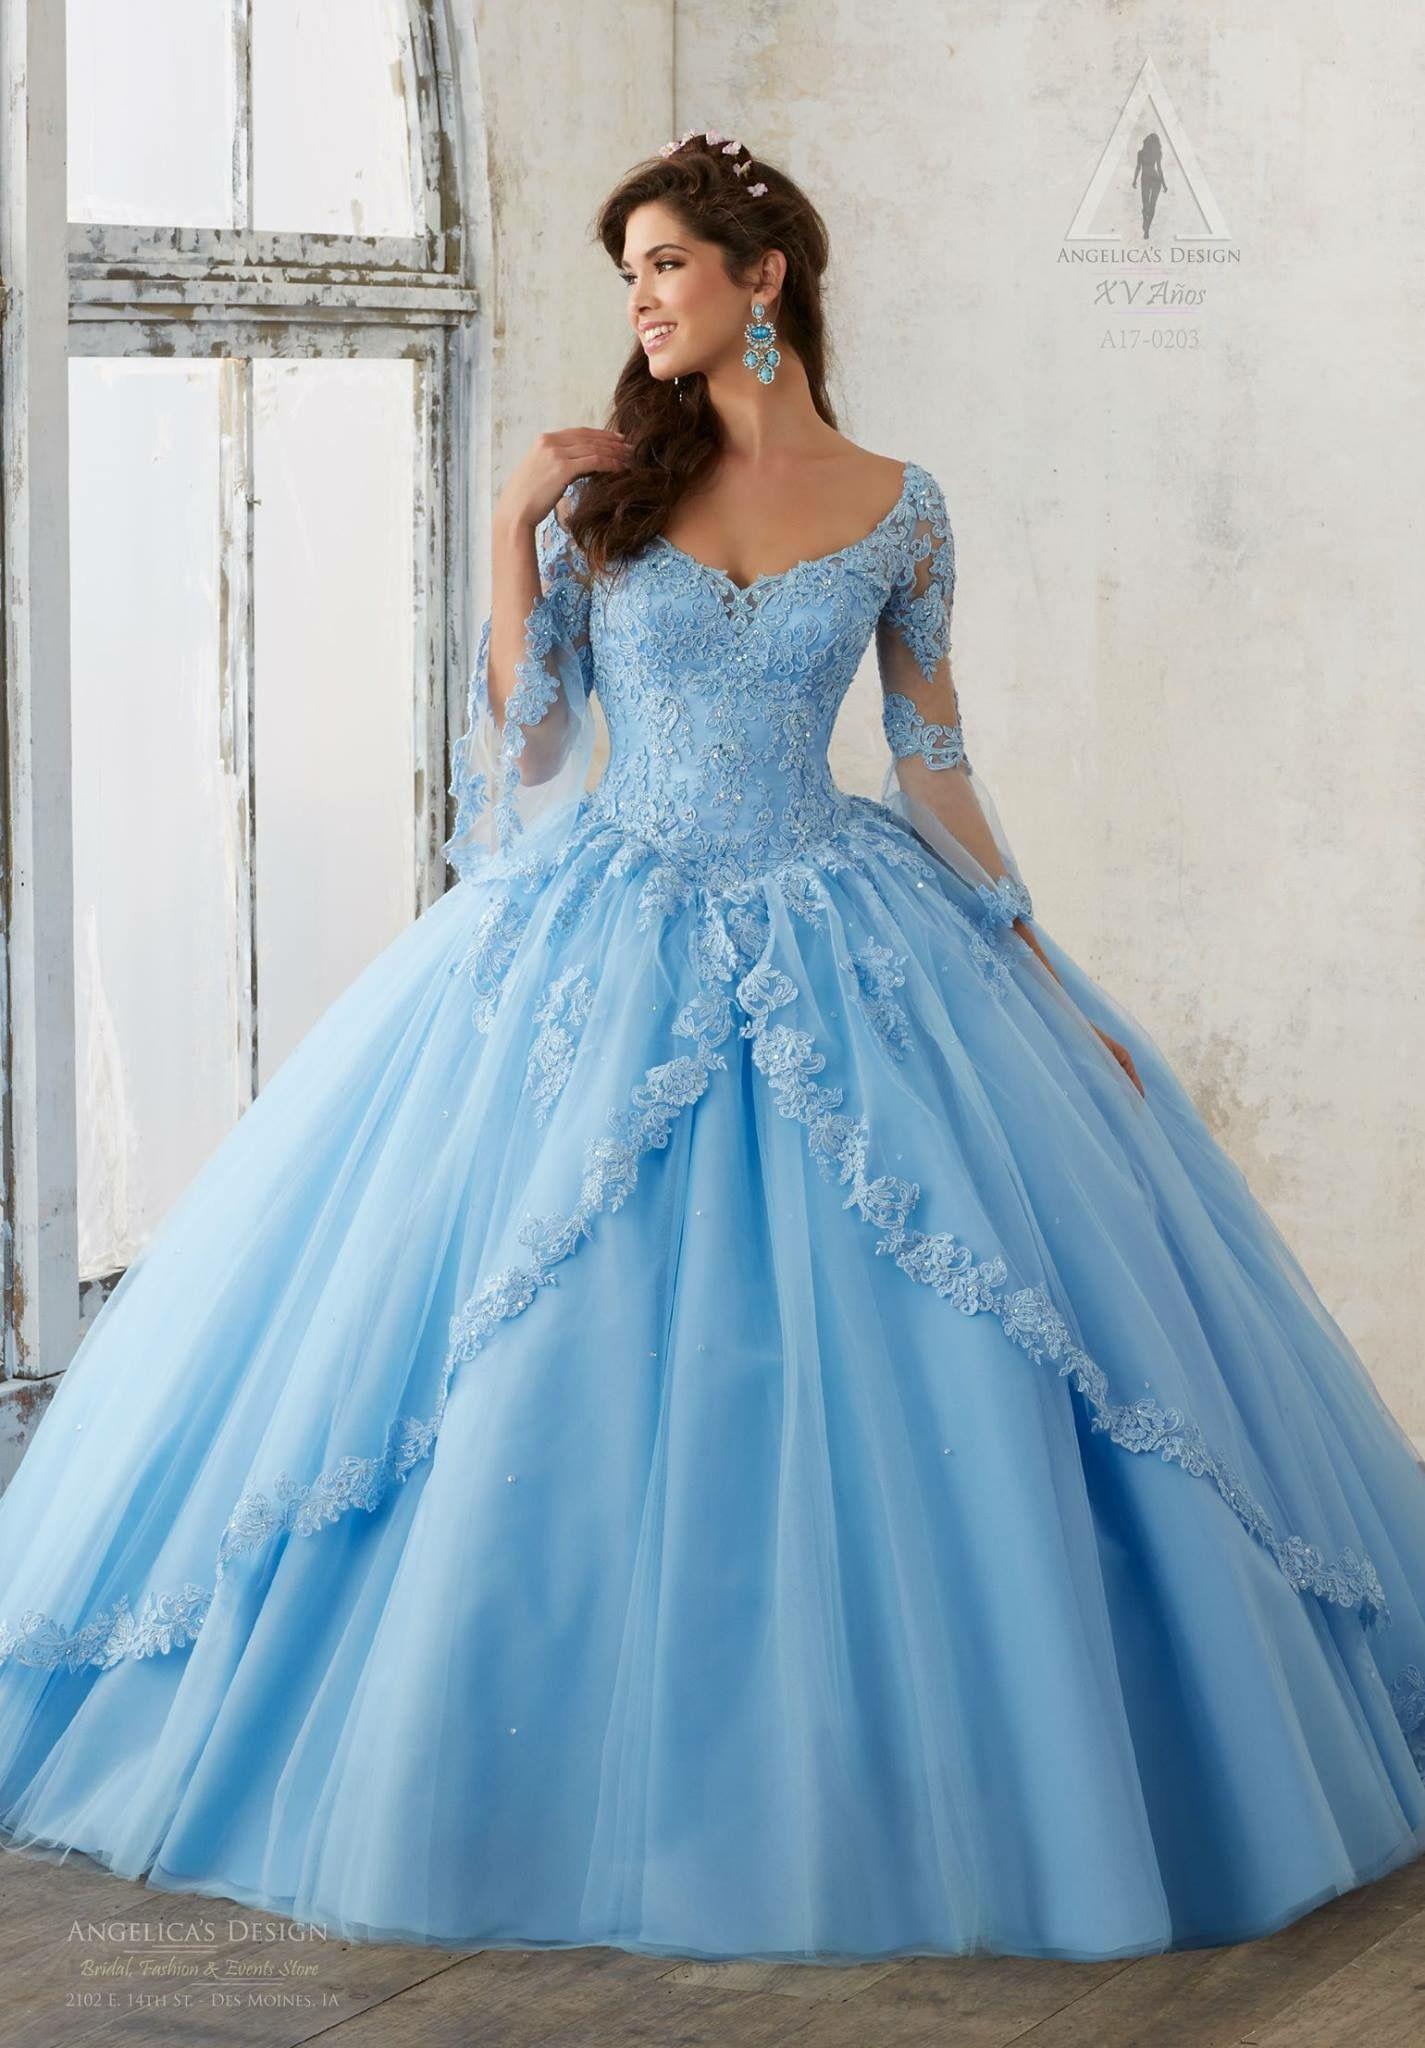 Pin by Morgan on Dresses | Pinterest | Dream prom, Cinderella ...